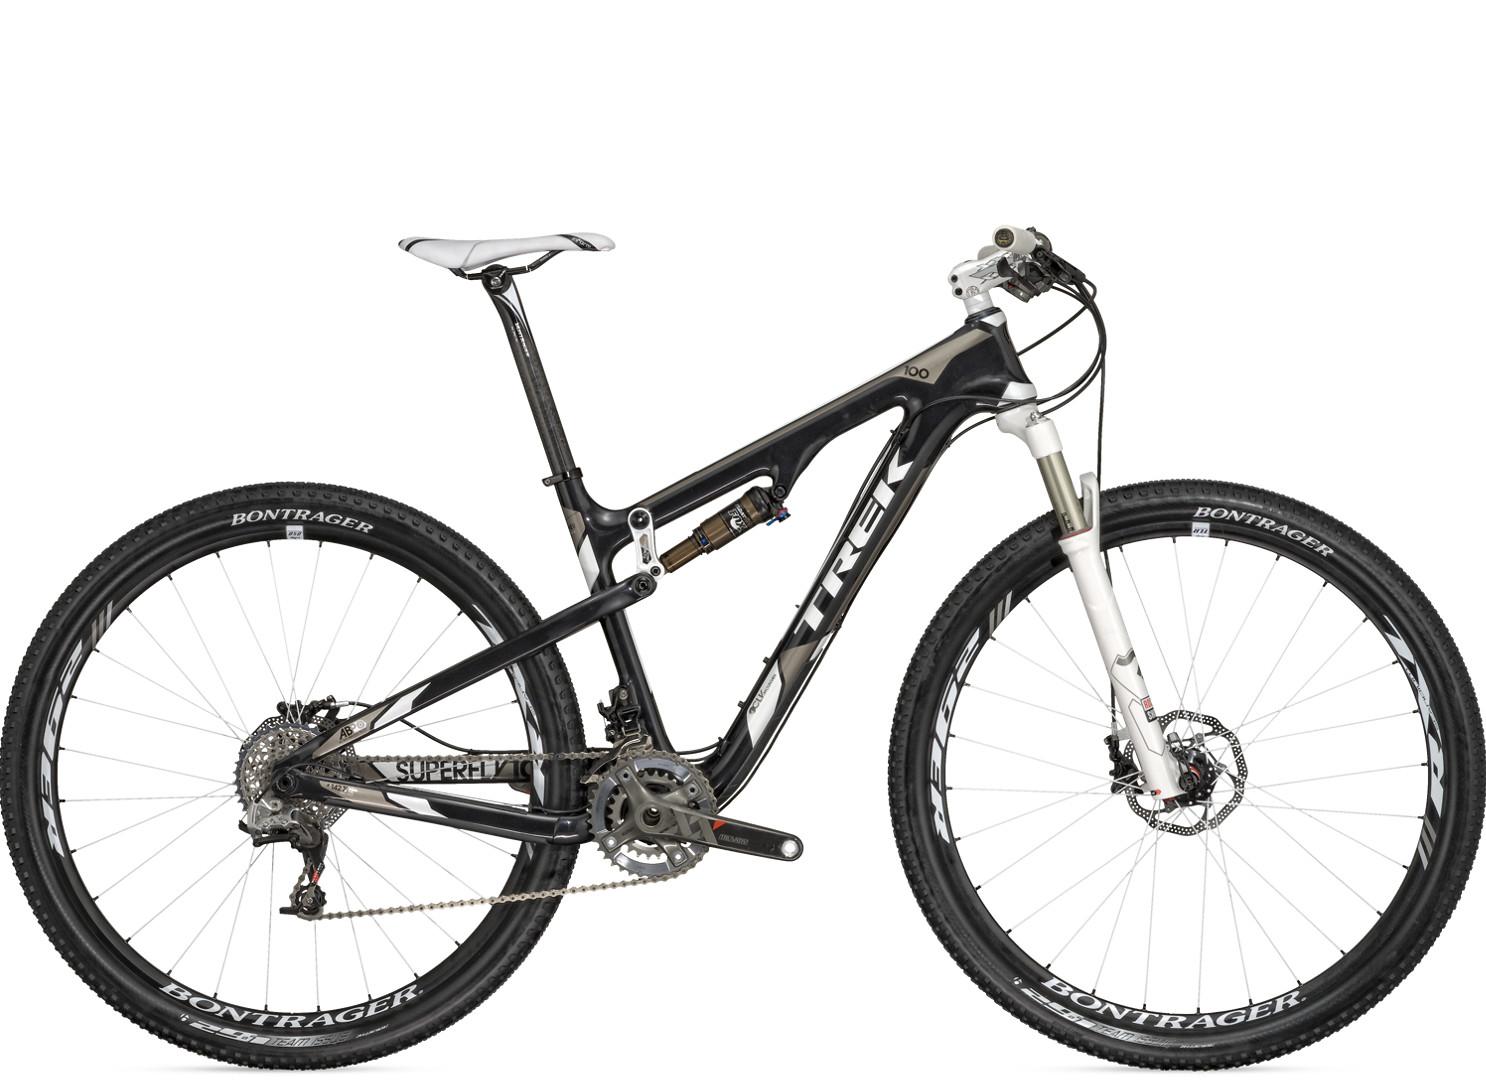 2012 Trek Superfly 100 Pro Bike - Reviews, Comparisons ...